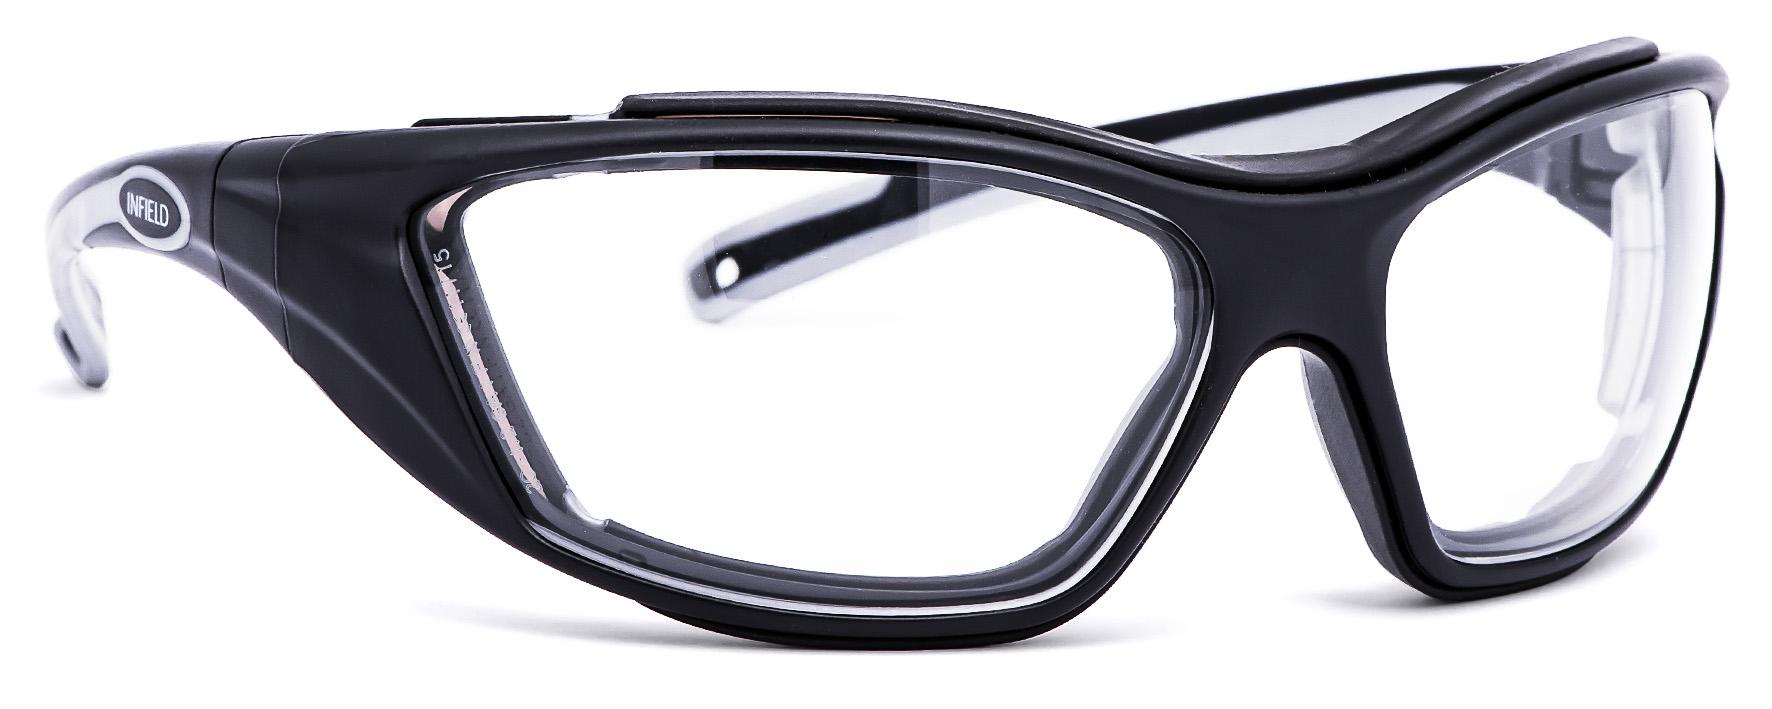 9611-155-COMBOR-schwarz-grau